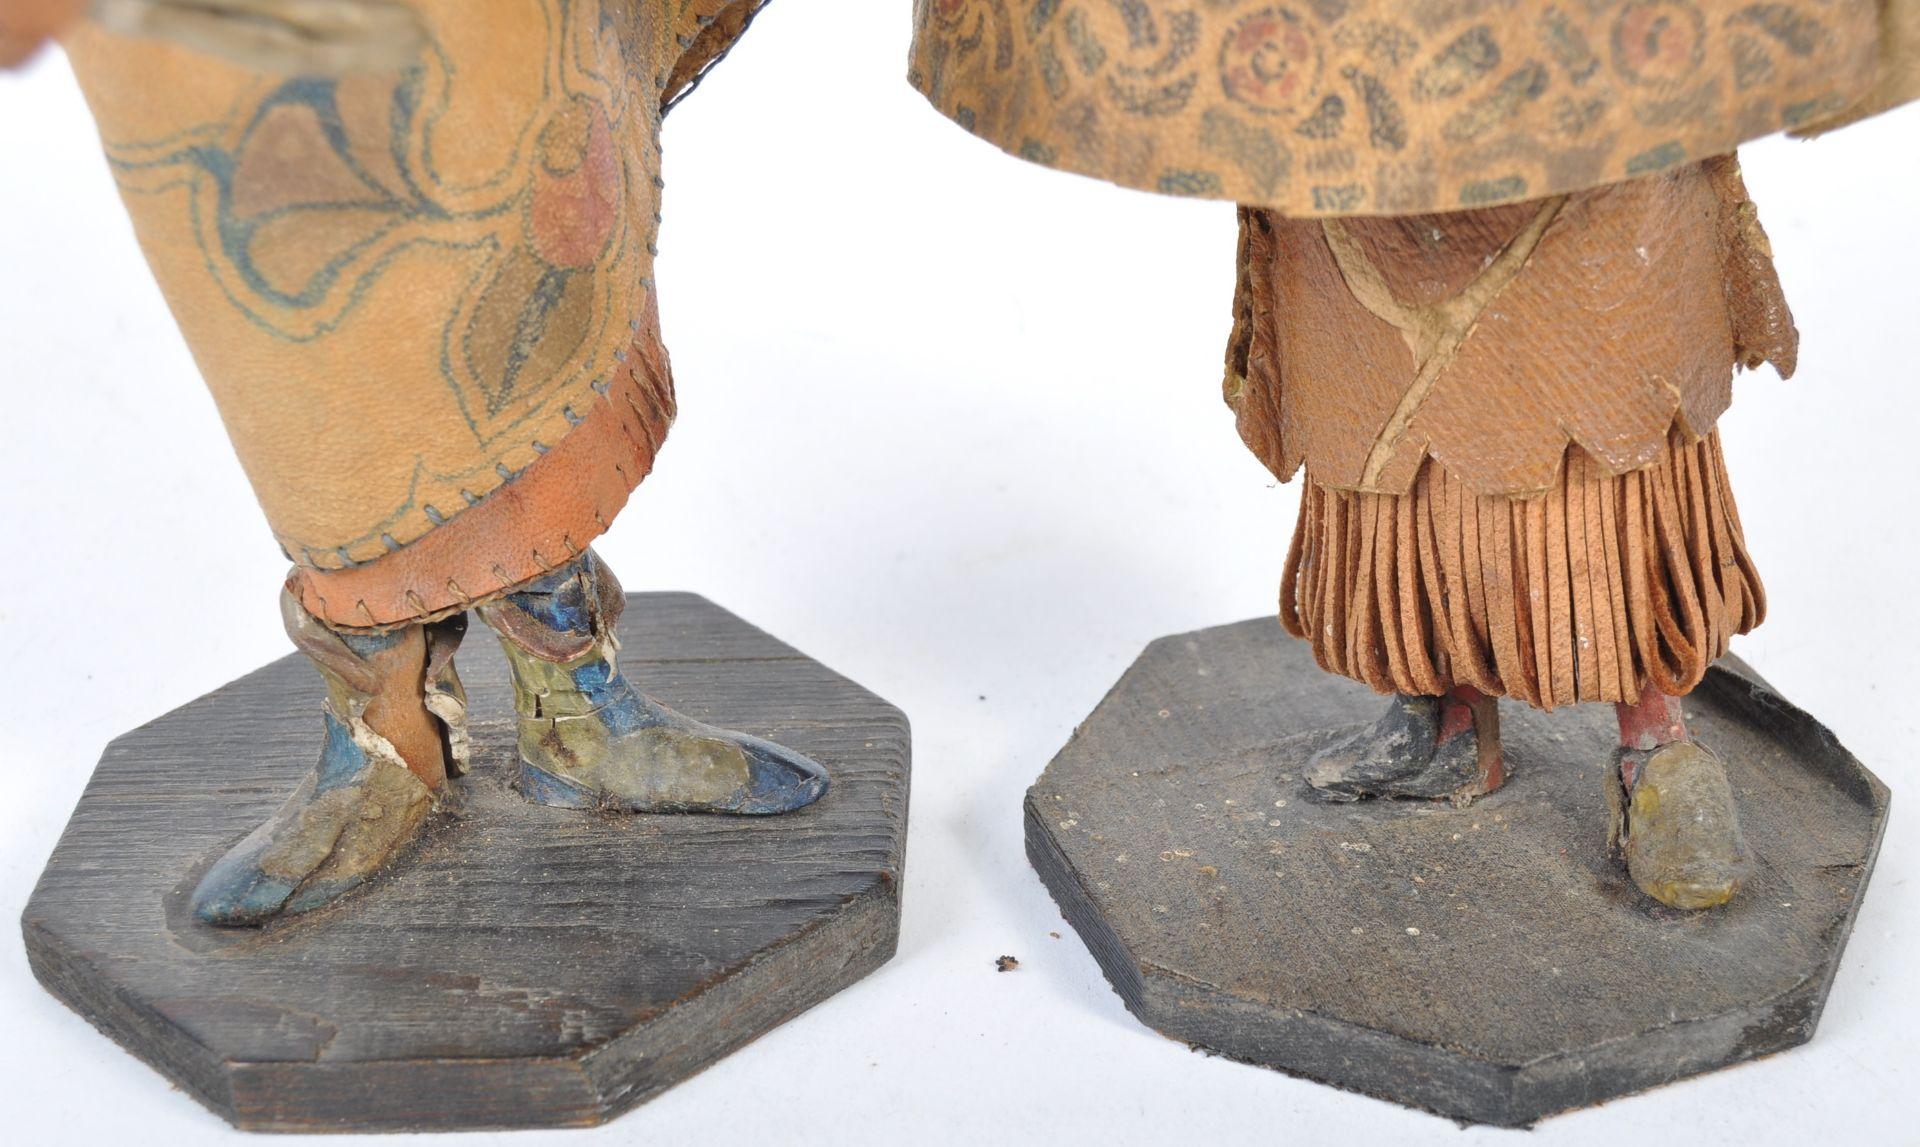 Los 915 - UNUSUAL PAIR OF 19TH CENTURY TUDOR STYLE WOODEN JE